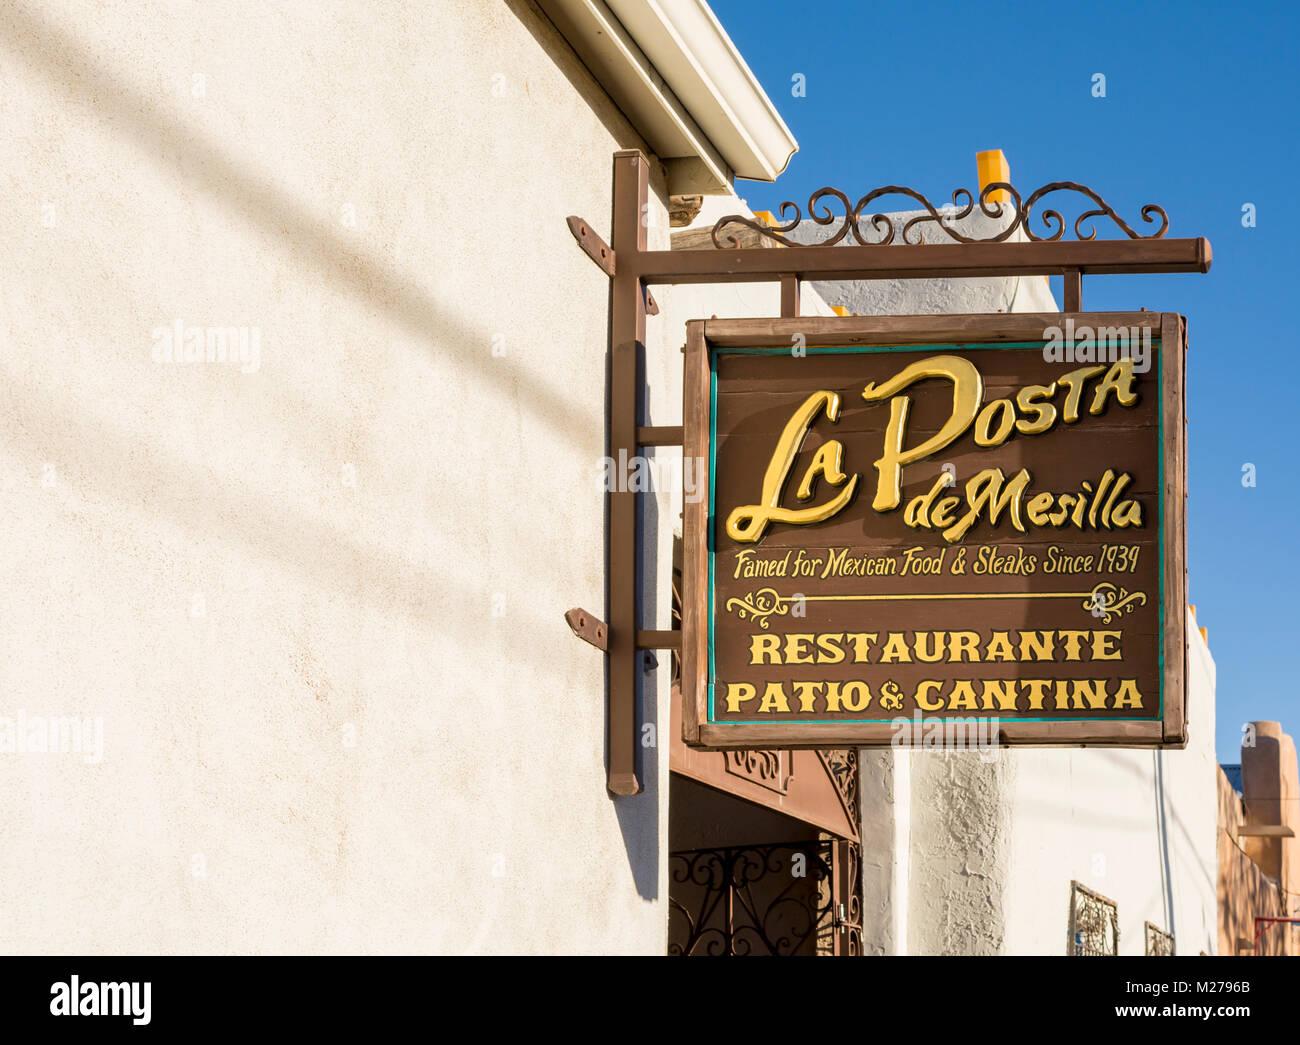 La Posta Mexican restaurant, patio, cantina in Old Mesilla, Las Cruces, New Mexico,USA. - Stock Image